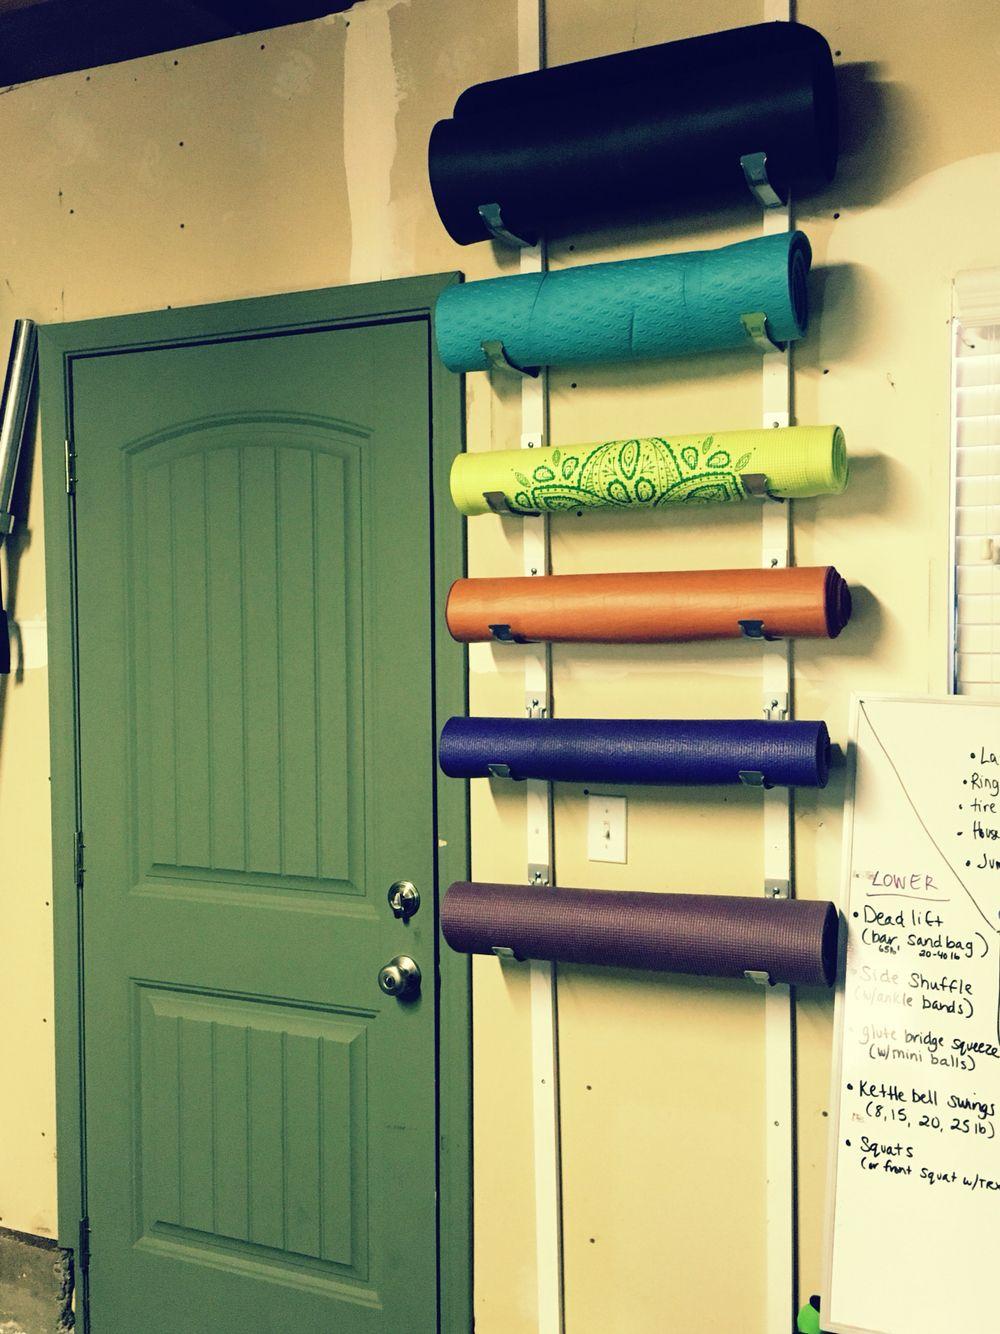 DIY yoga mat and foam roller holder for home gym. Each set